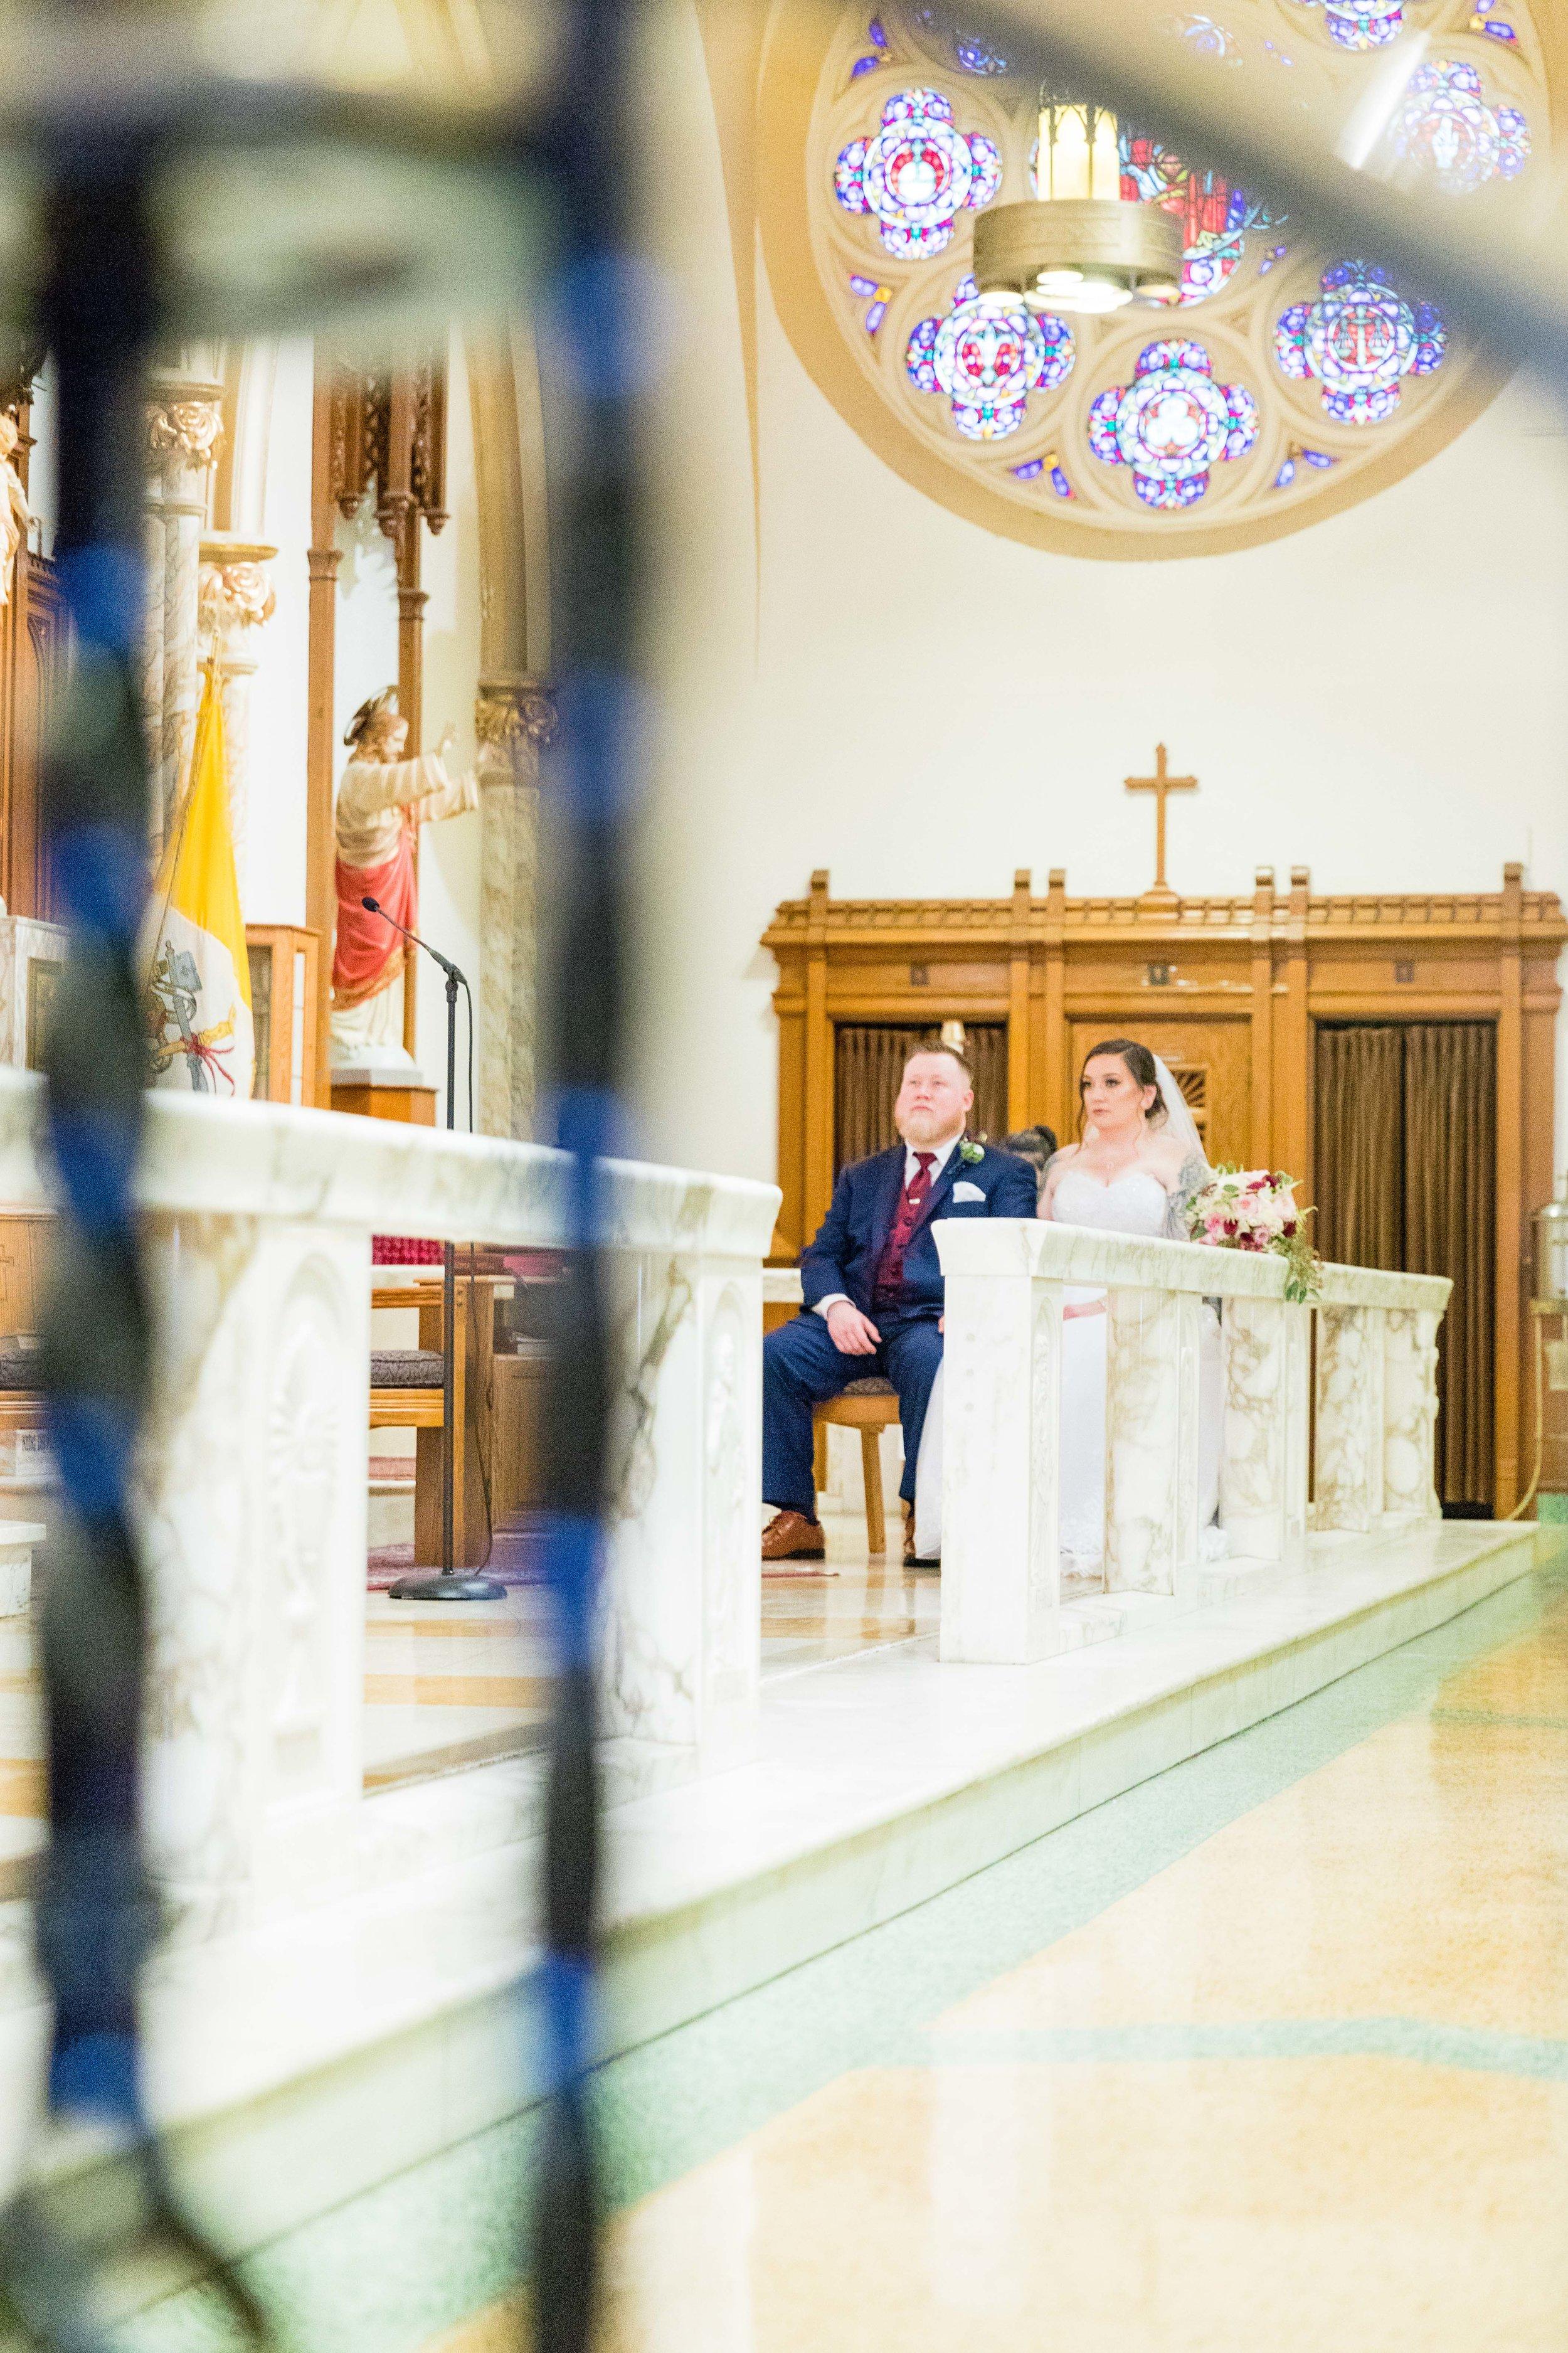 KRISTINA AND SHAWN - WATERFALL ROOM WEDDING - PHILADELPHIA-46.jpg